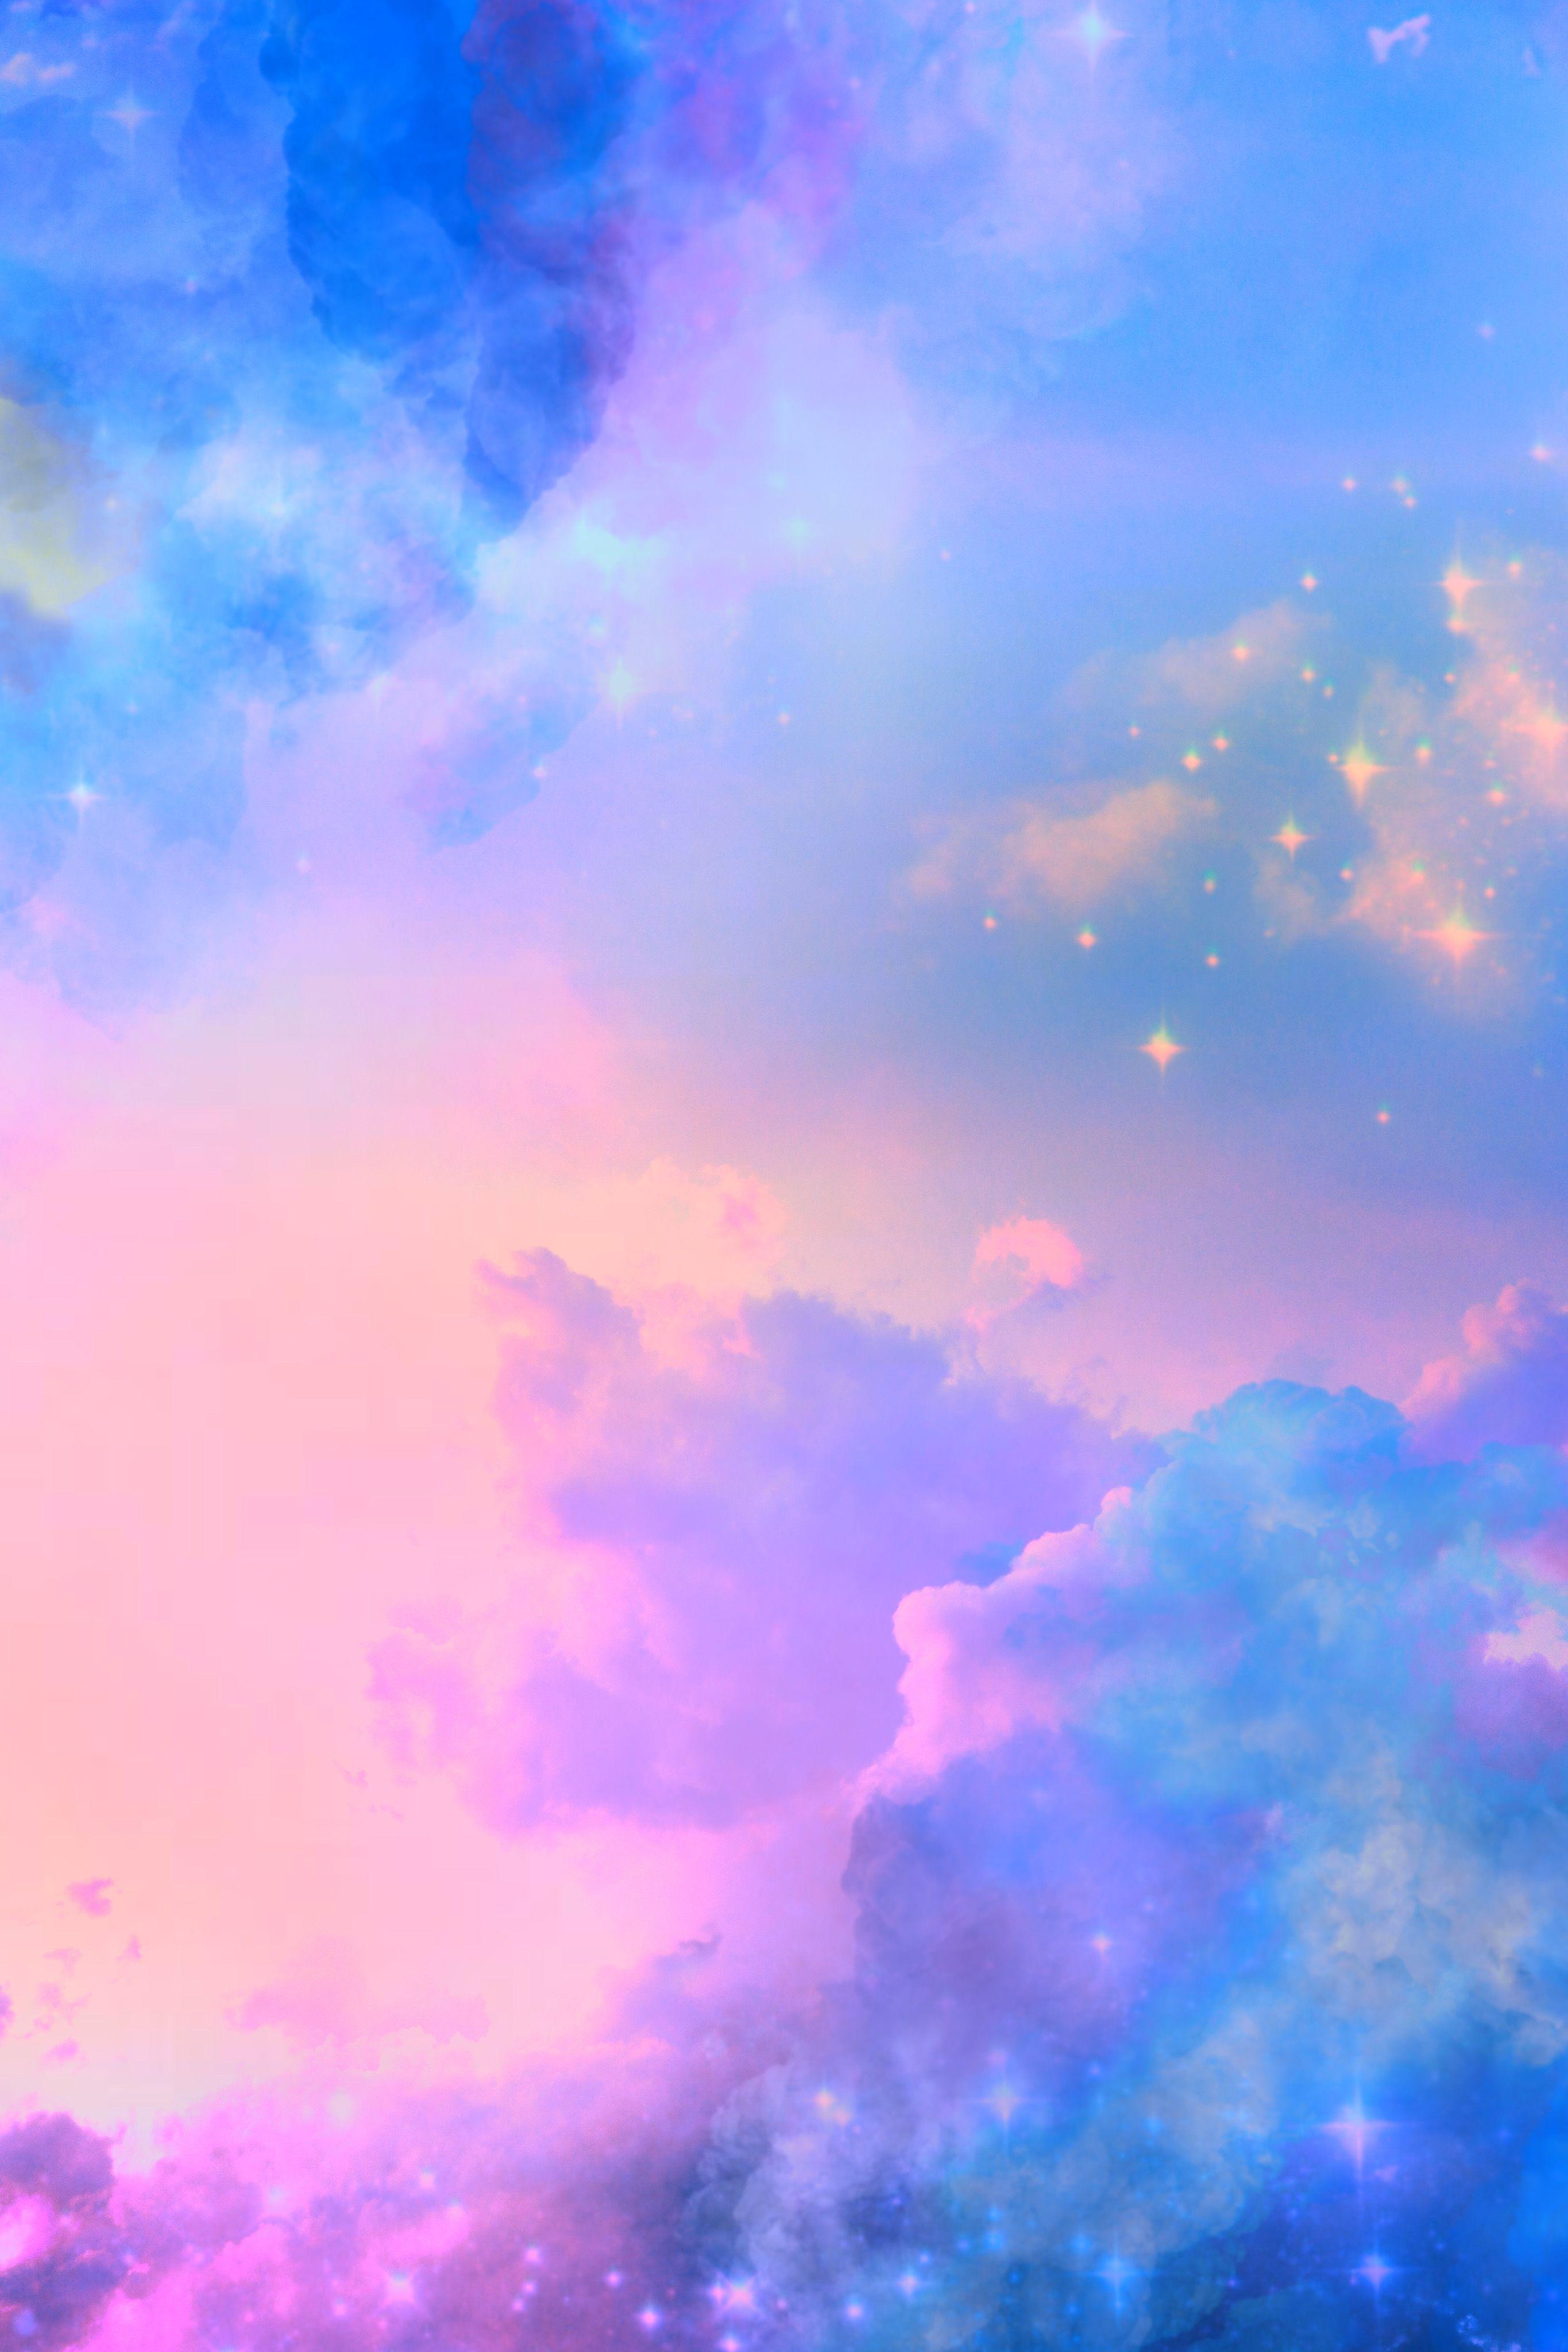 Glitter Sparkle Galaxy Sky Stars Clouds Pastel Sunset Night Pink Blue Landscape Nature Love Pink Wallpaper Pink Wallpaper Blue Wallpapers